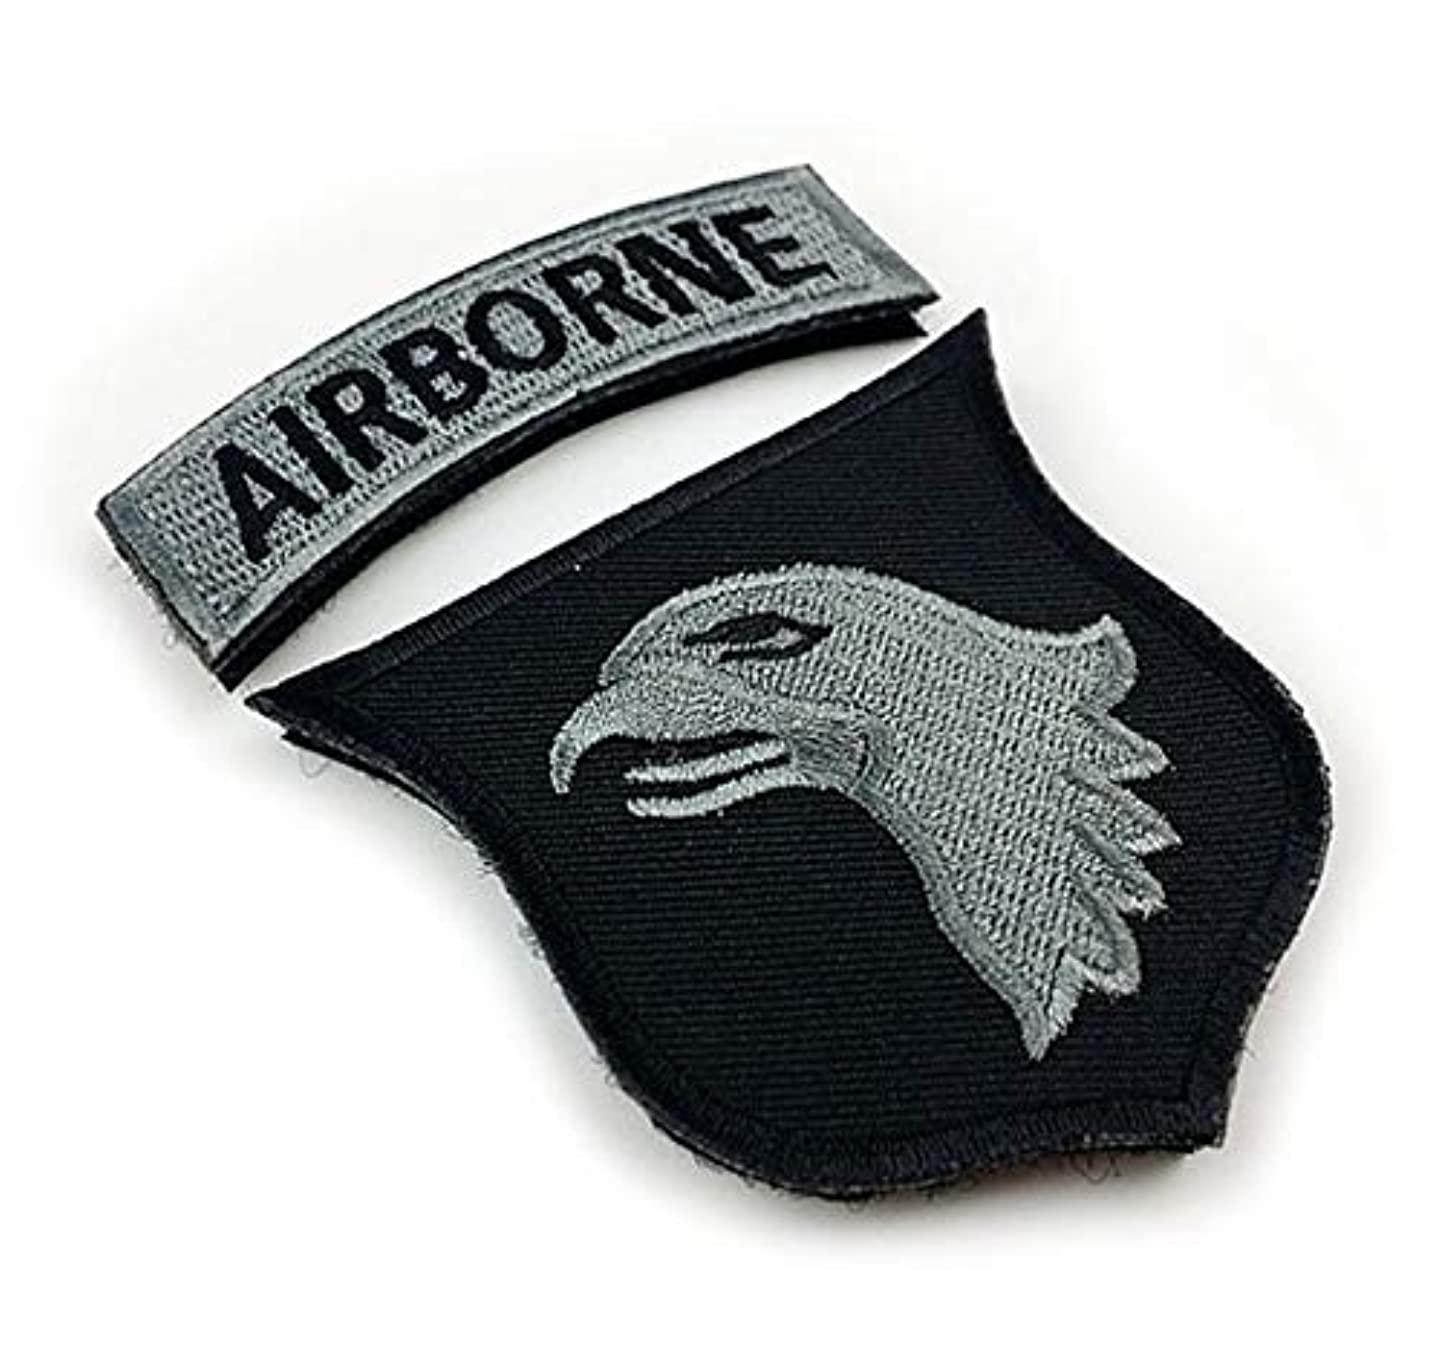 Morton Home 101st Airborne Patch Screaming Eagles Embroidered Applique Badge Sign Costume Paratrooper Shoulder Patch Hook&Loop Fastener Backing Patch (Airborne-Black+greySilver)